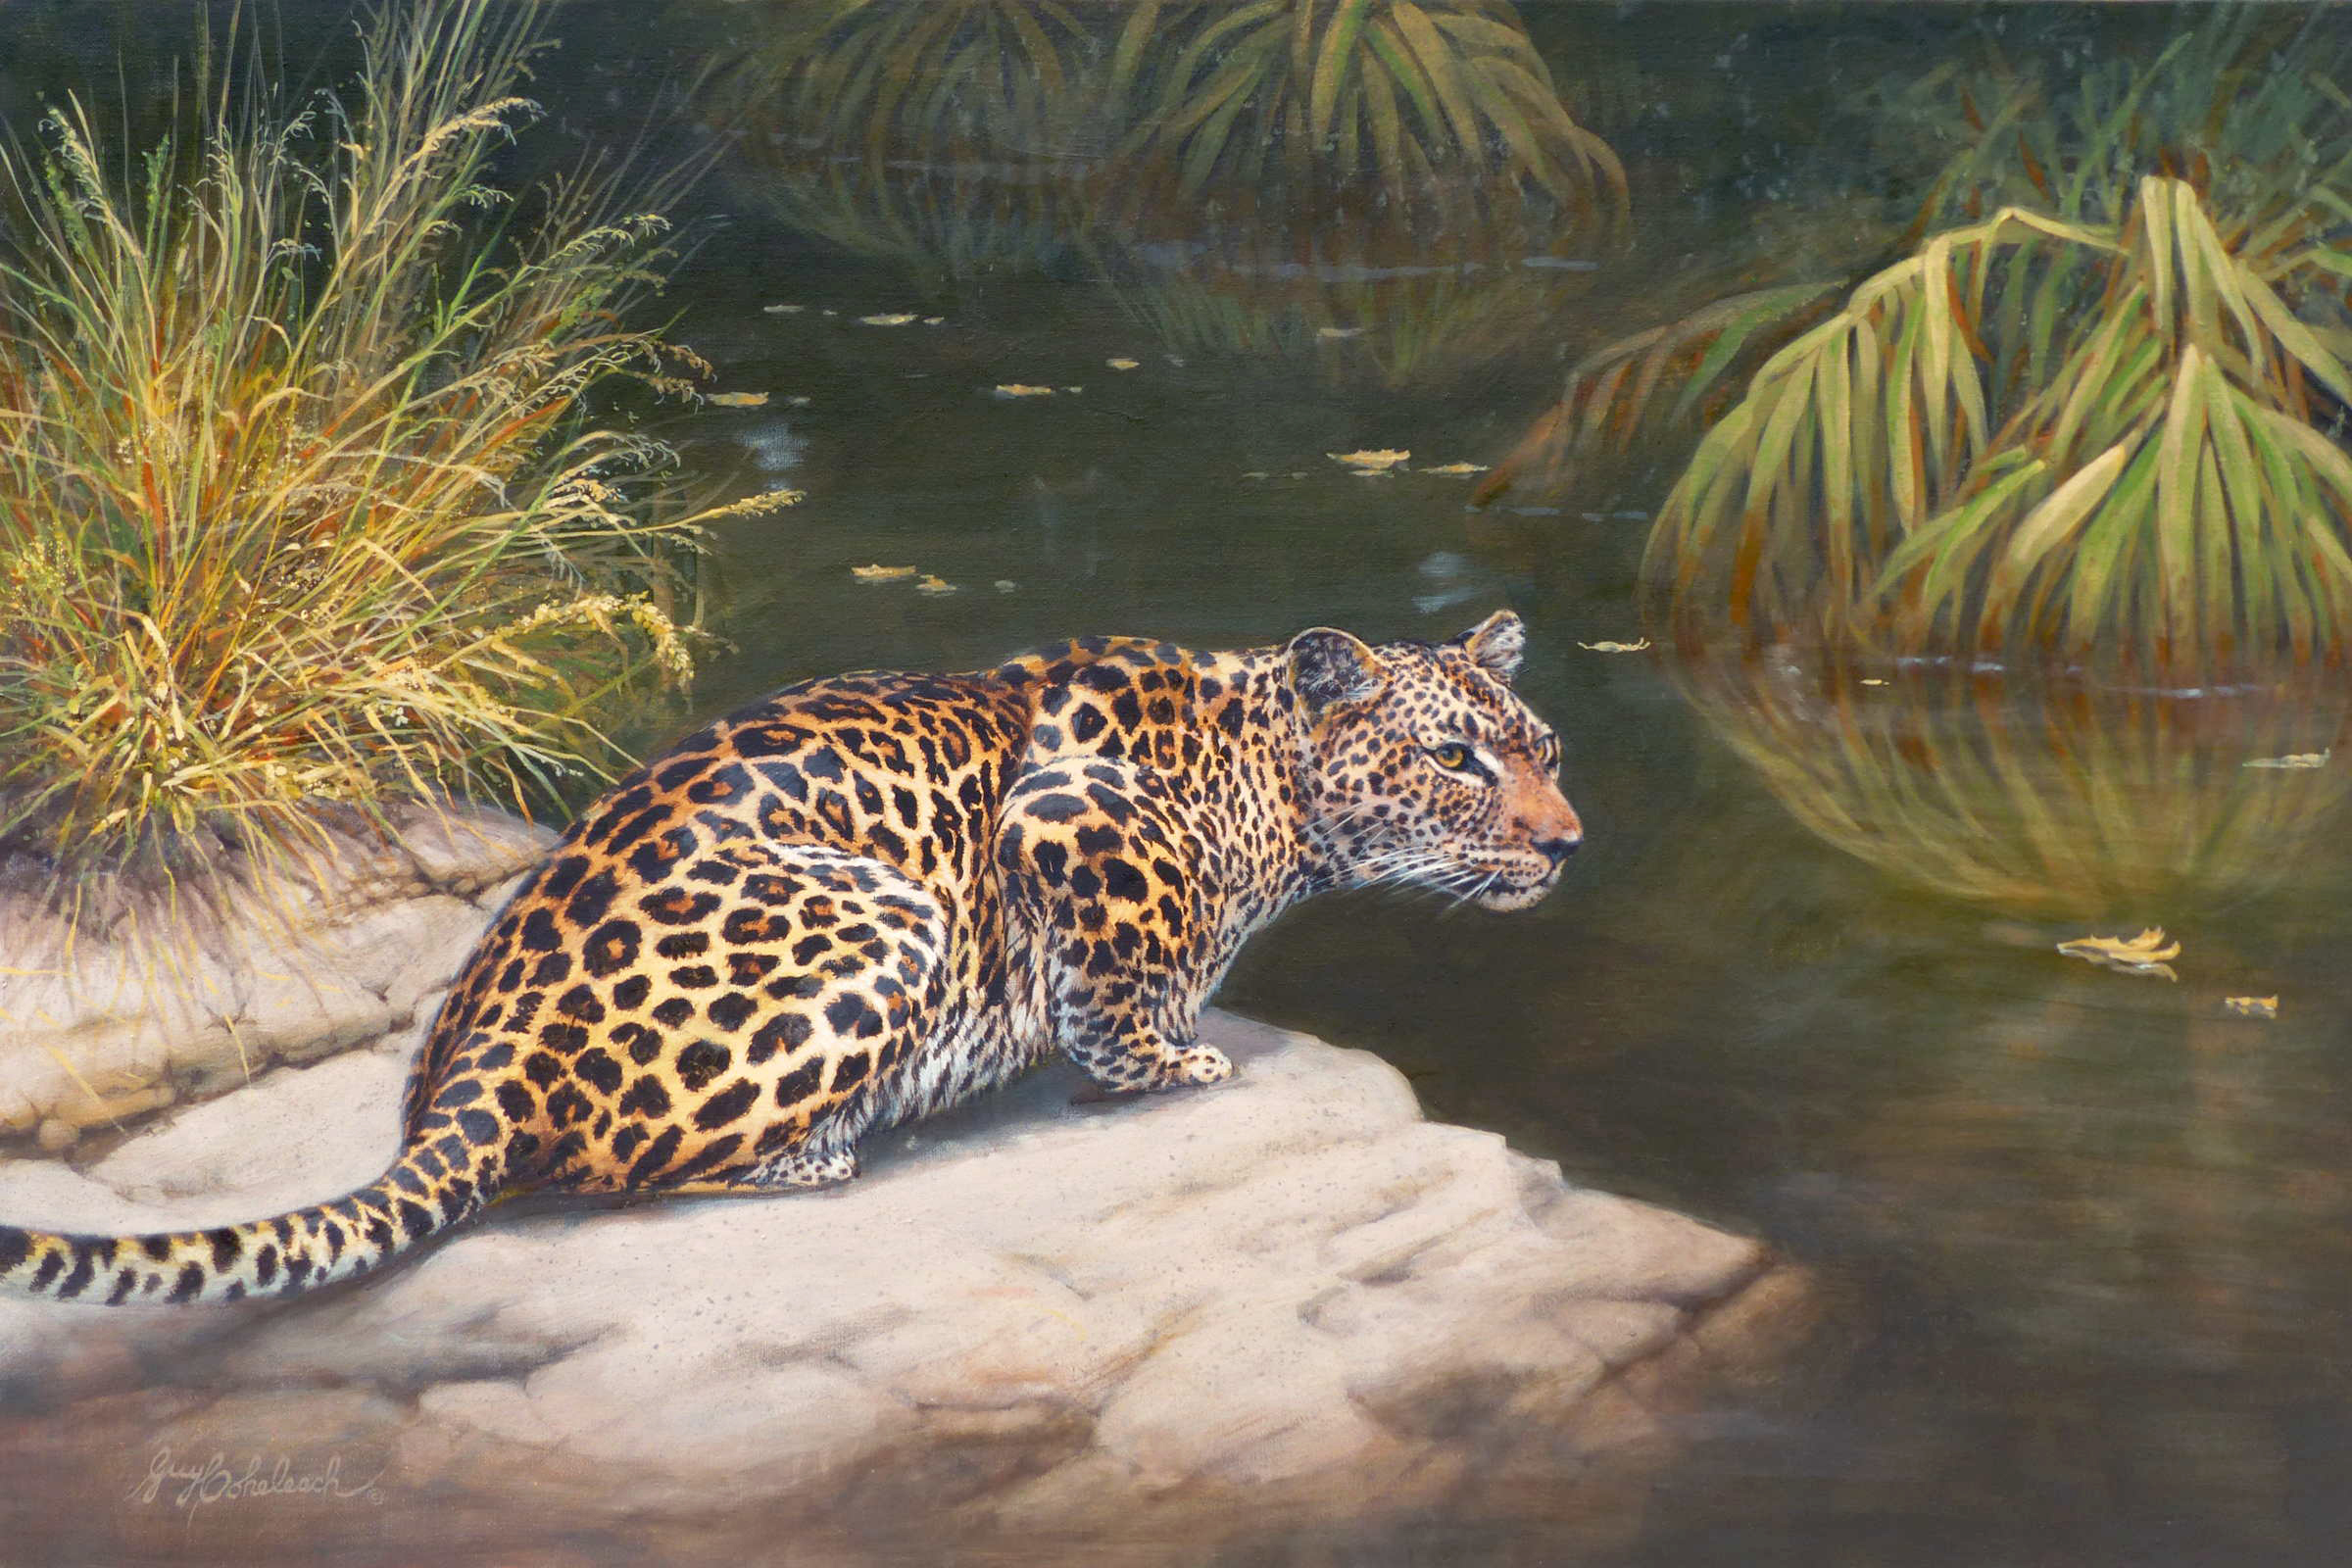 Current Exhibition: Guy Coheleach Wildlife Art